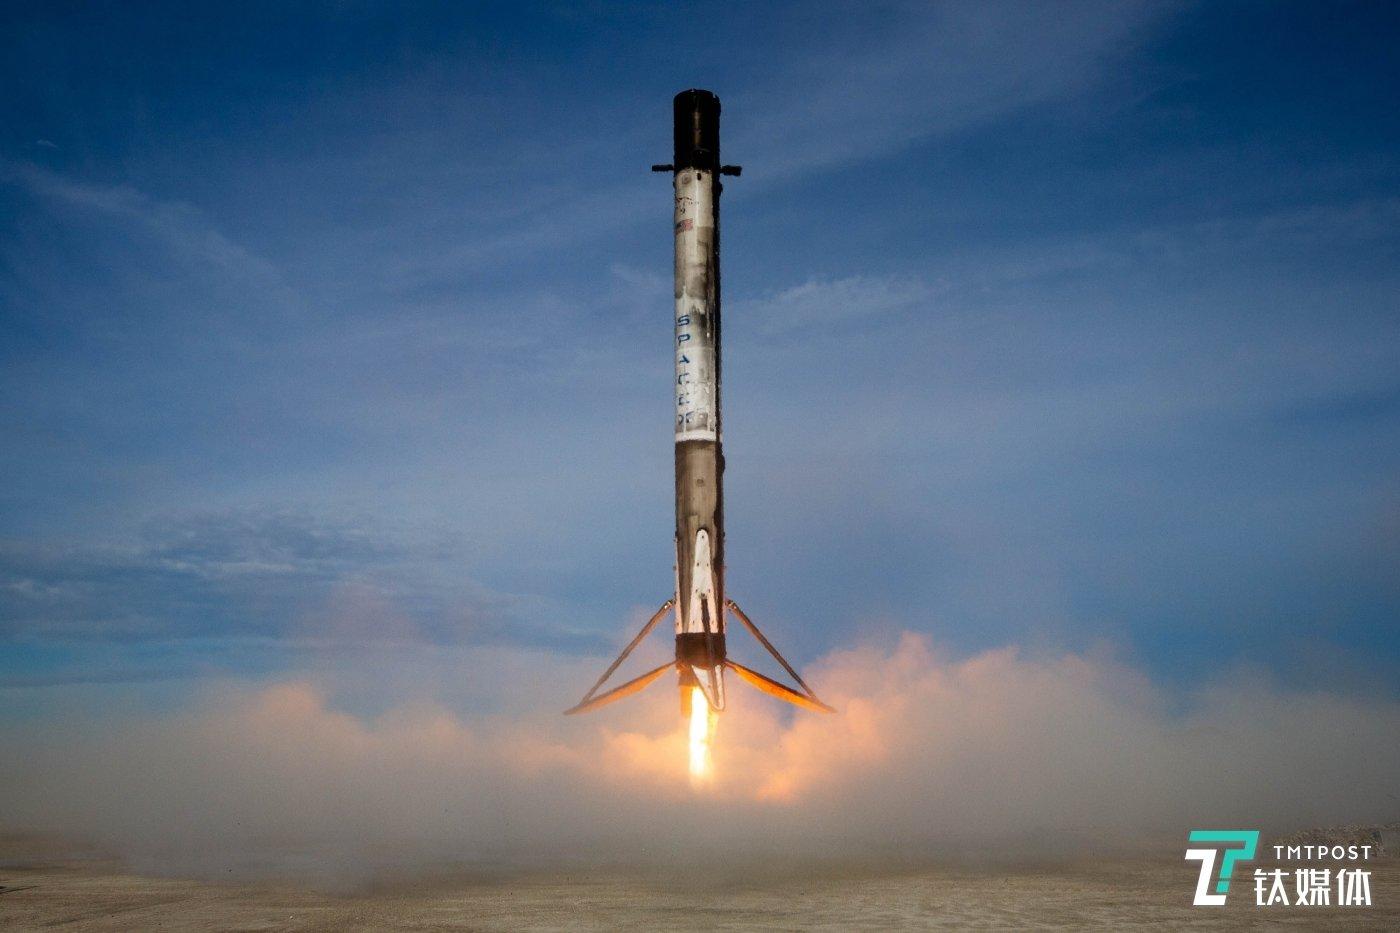 SpaceX的猎鹰火箭升空测试